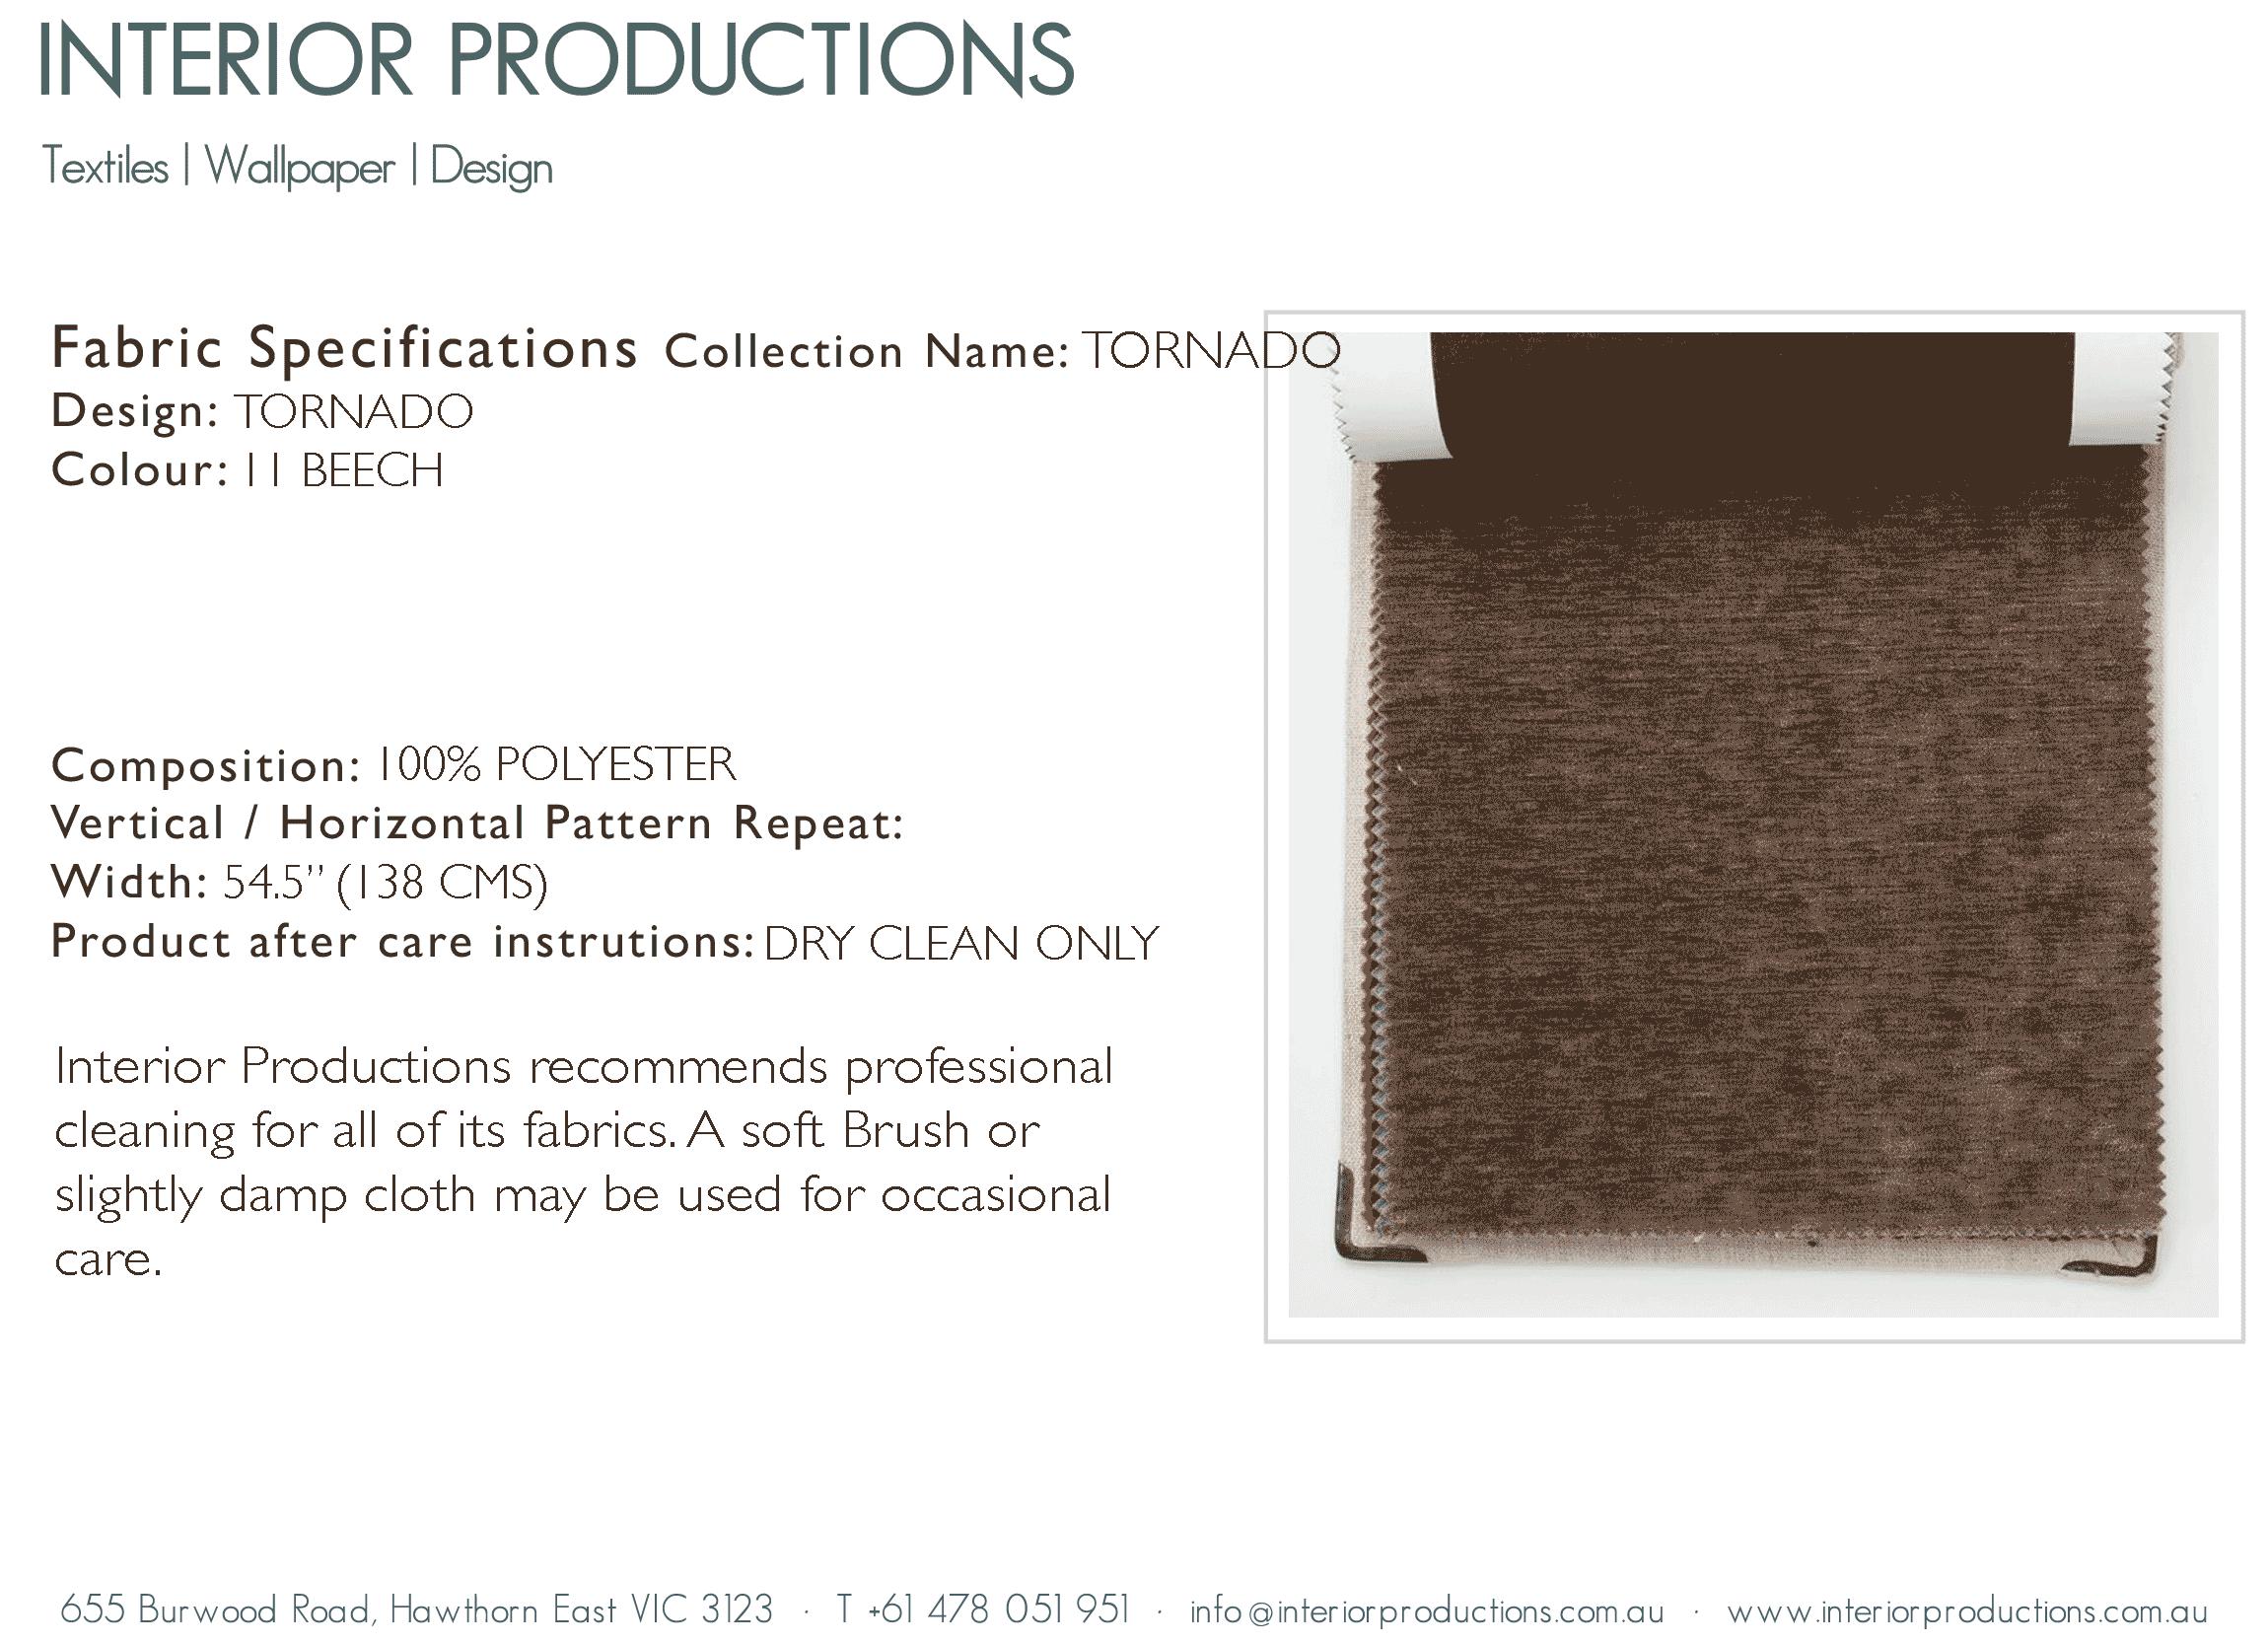 interior_productions_TORNADO---11-BEECH